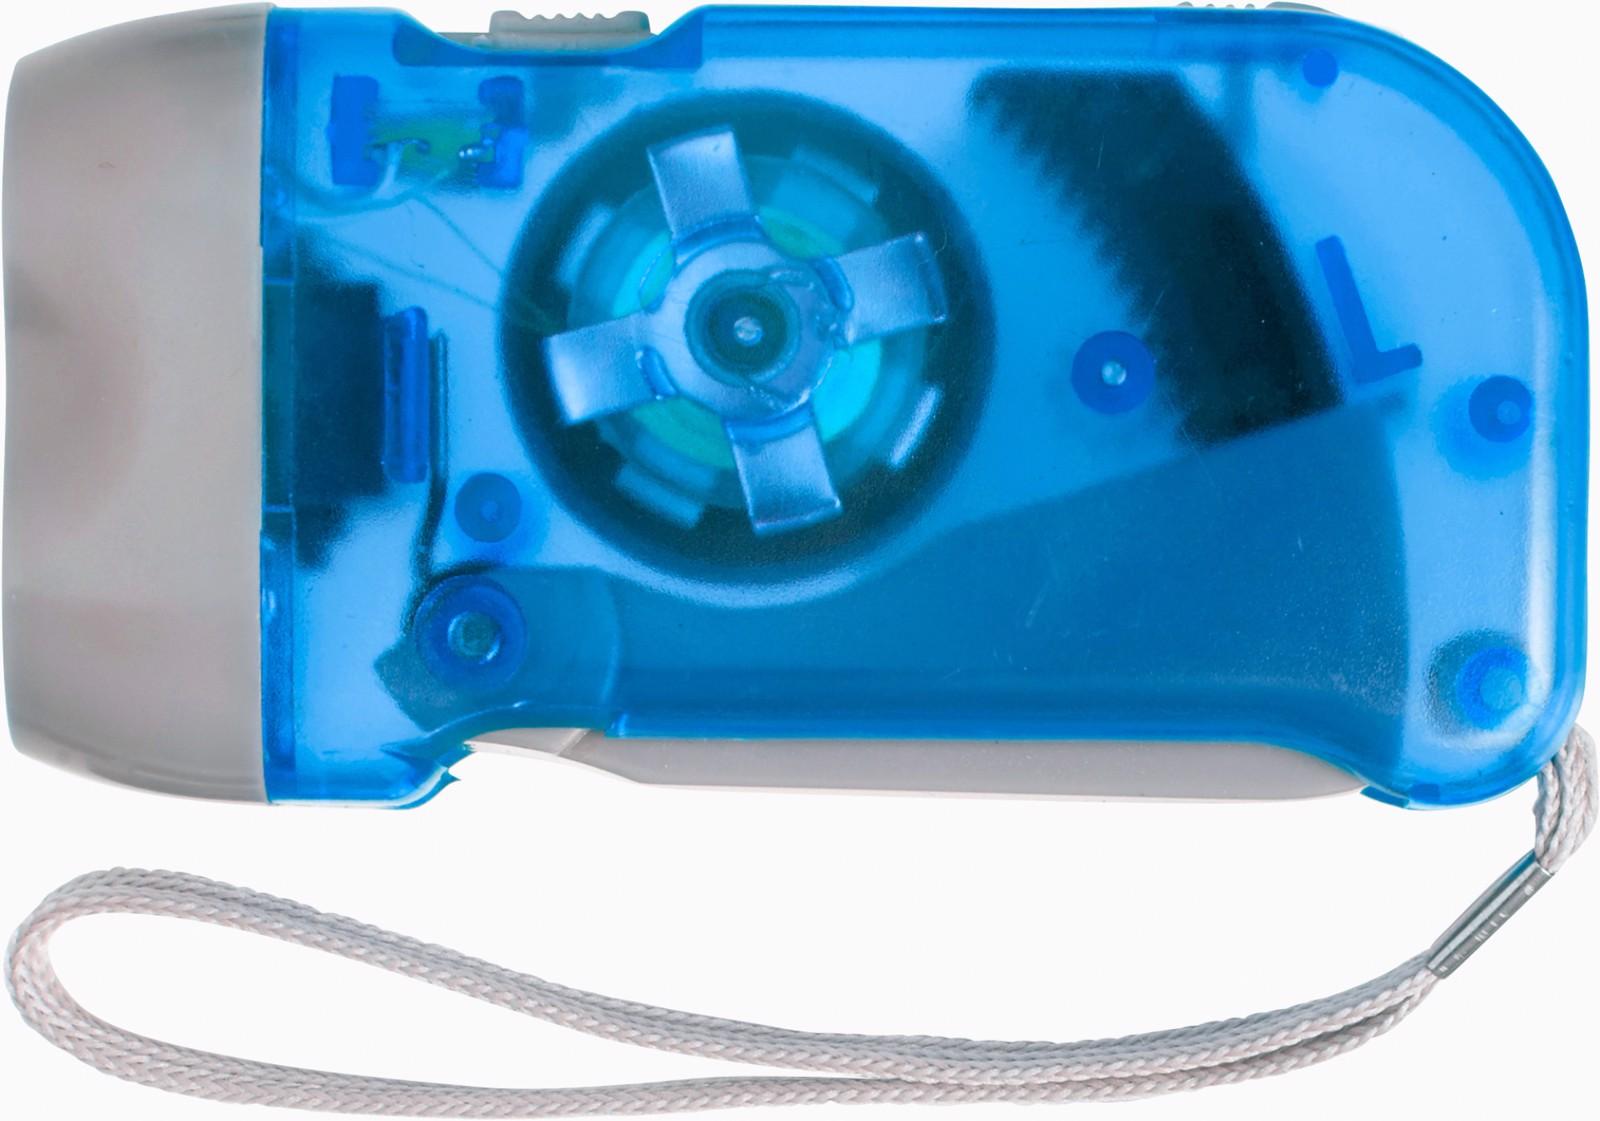 ABS dynamo torch - Cobalt Blue